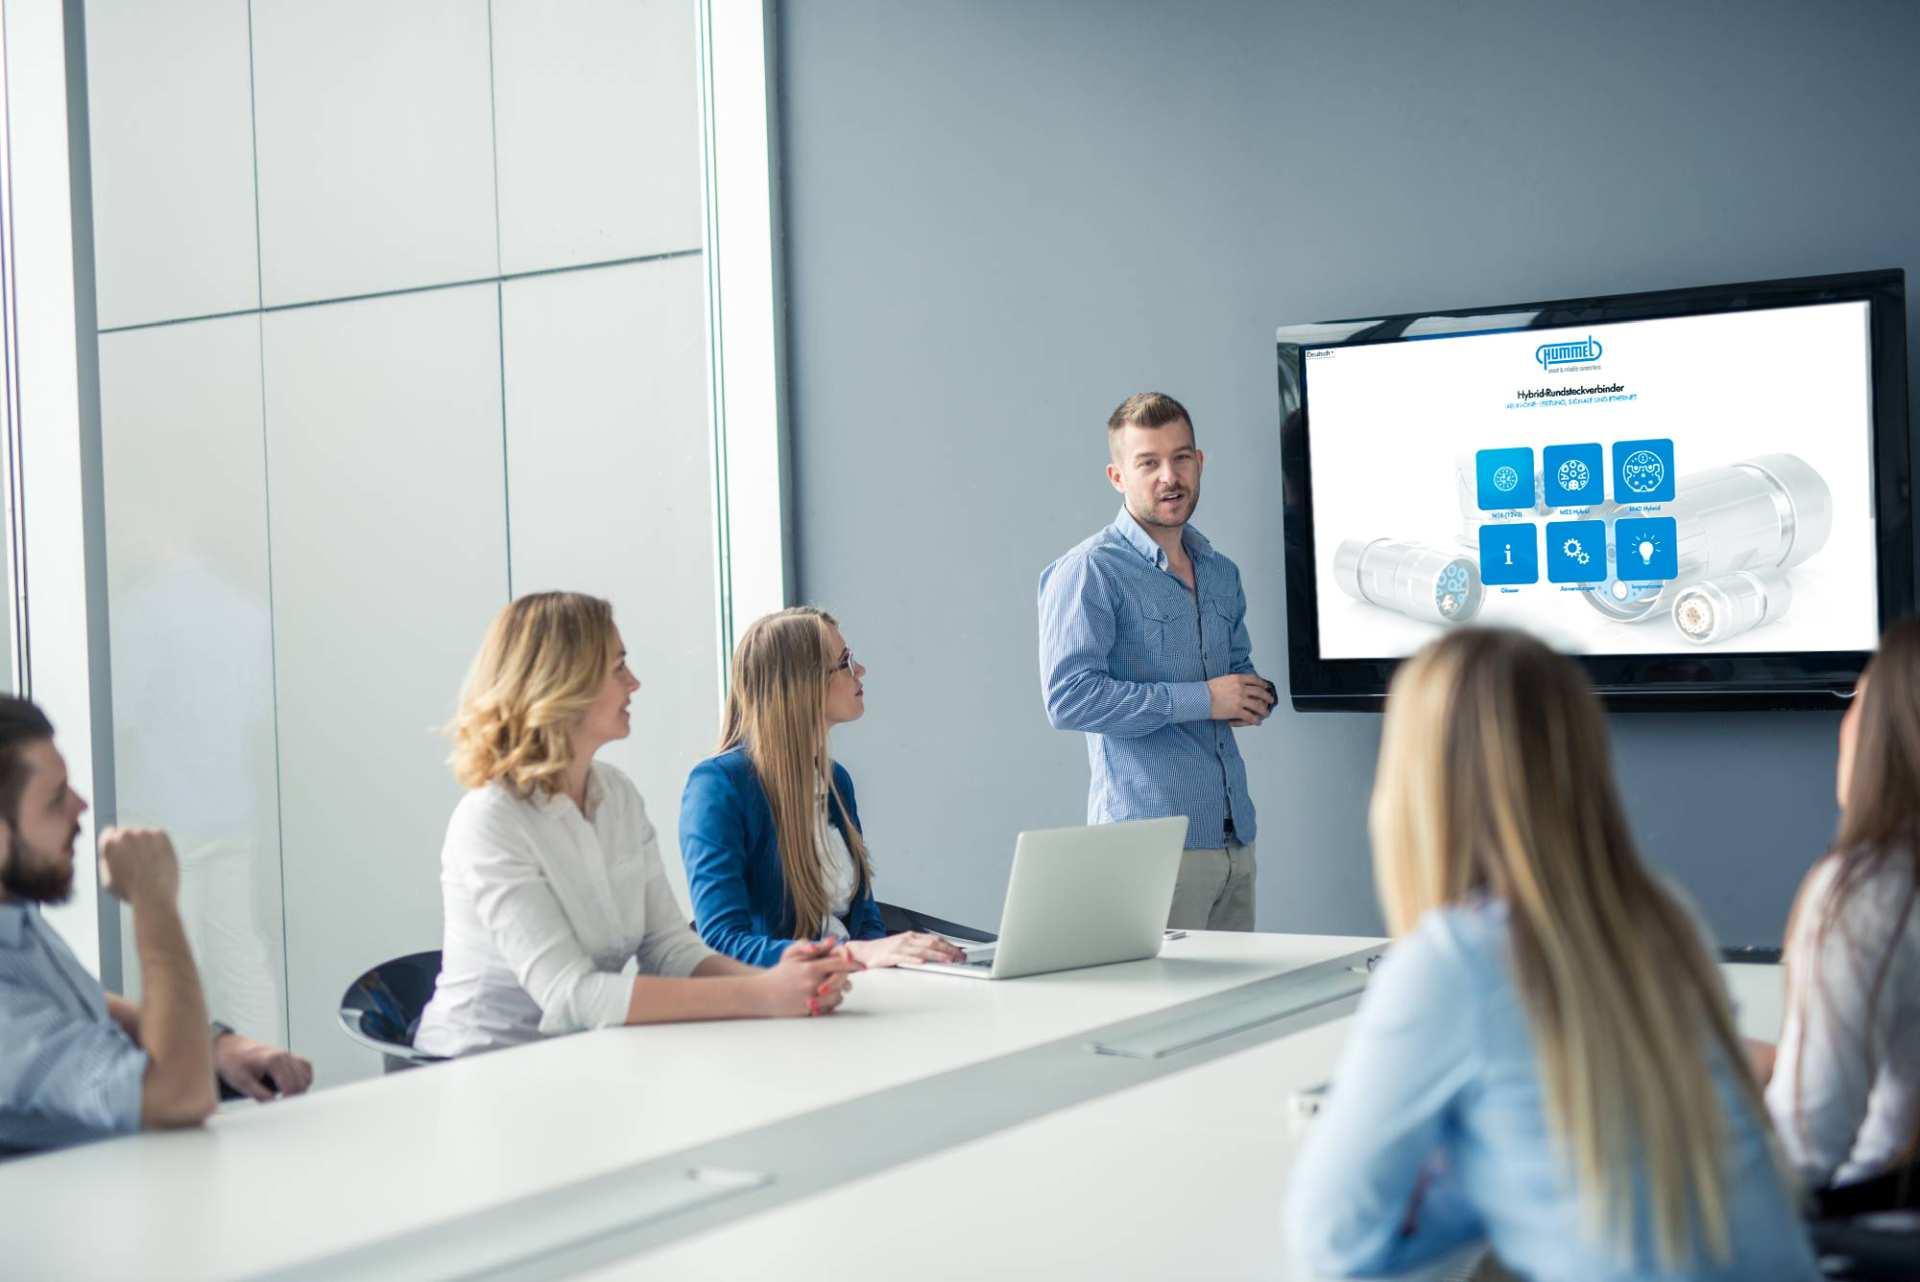 Präsentation mit commalive Präsentations-App in Besprechungsraum